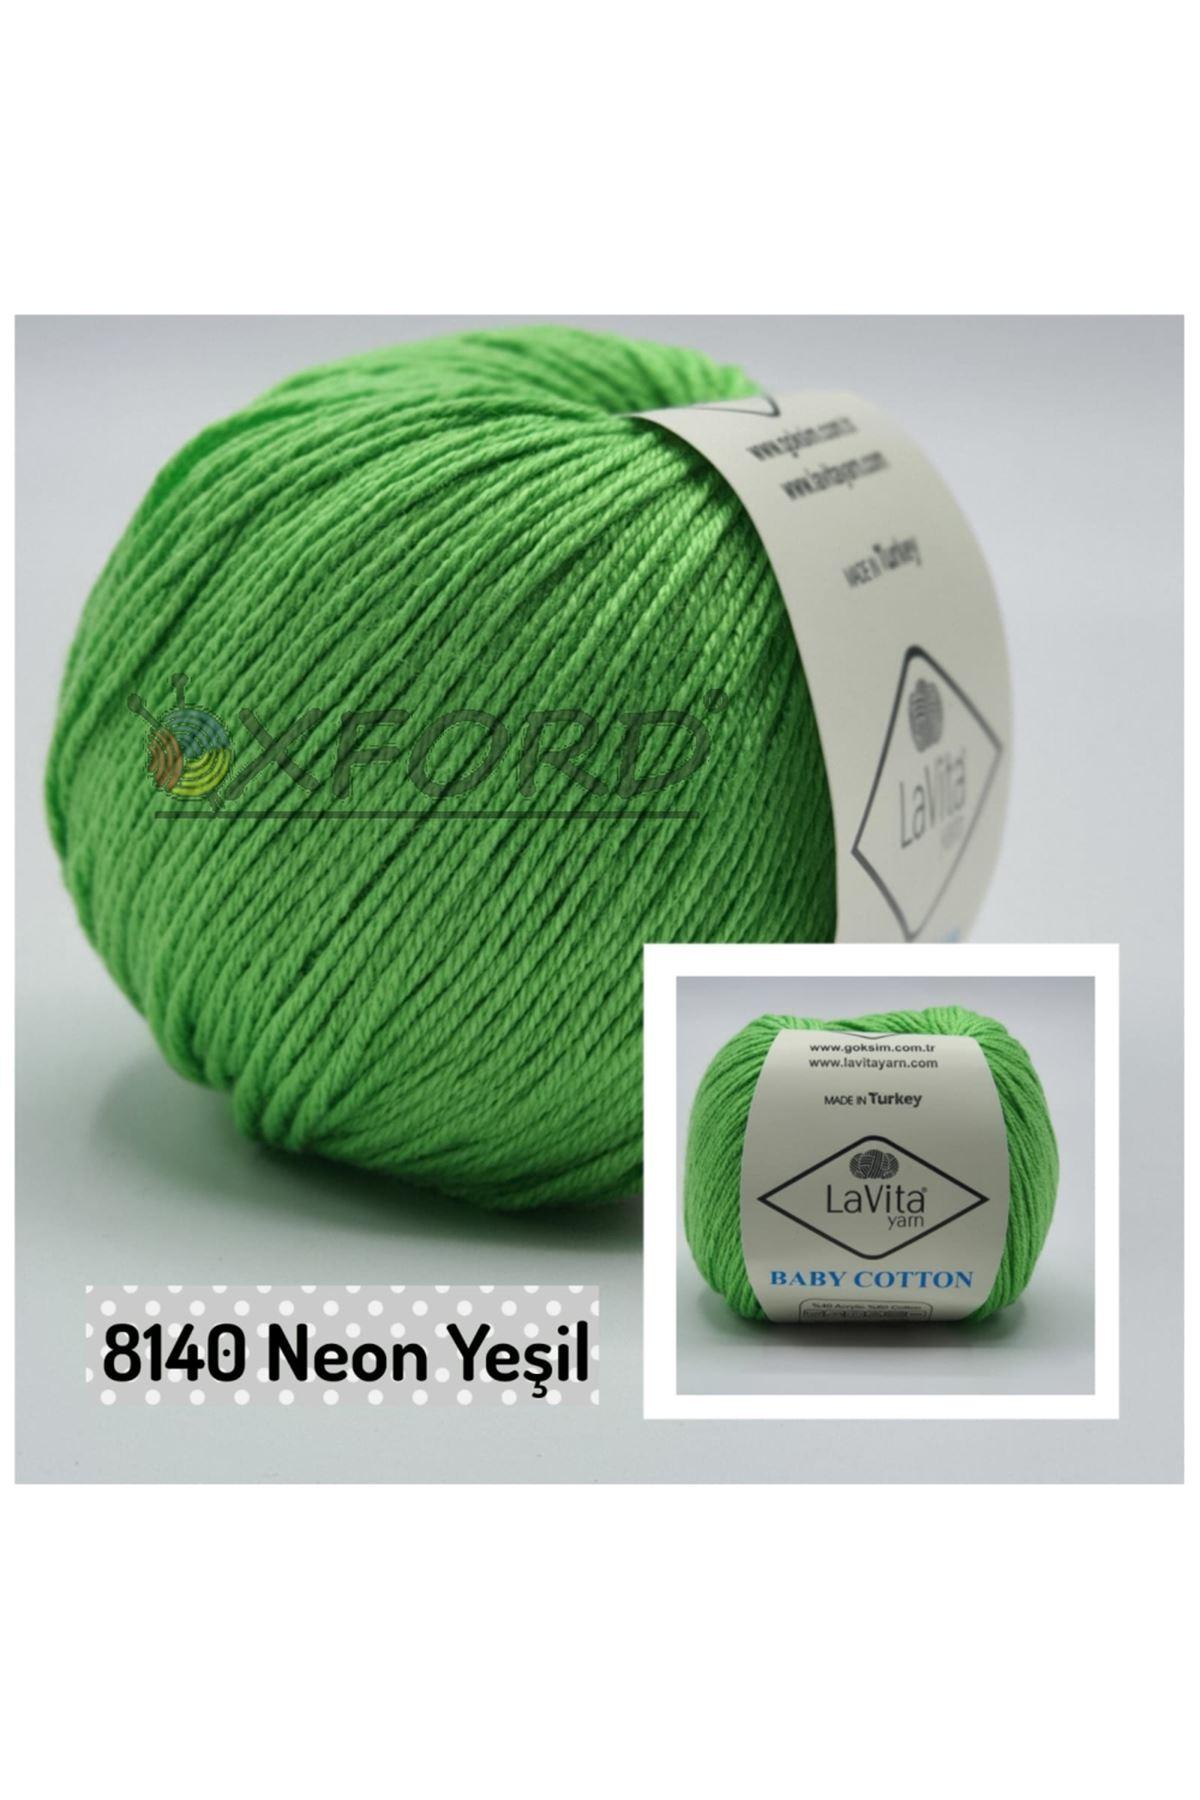 Lavita Baby Cotton 8140 Neon Yeşil